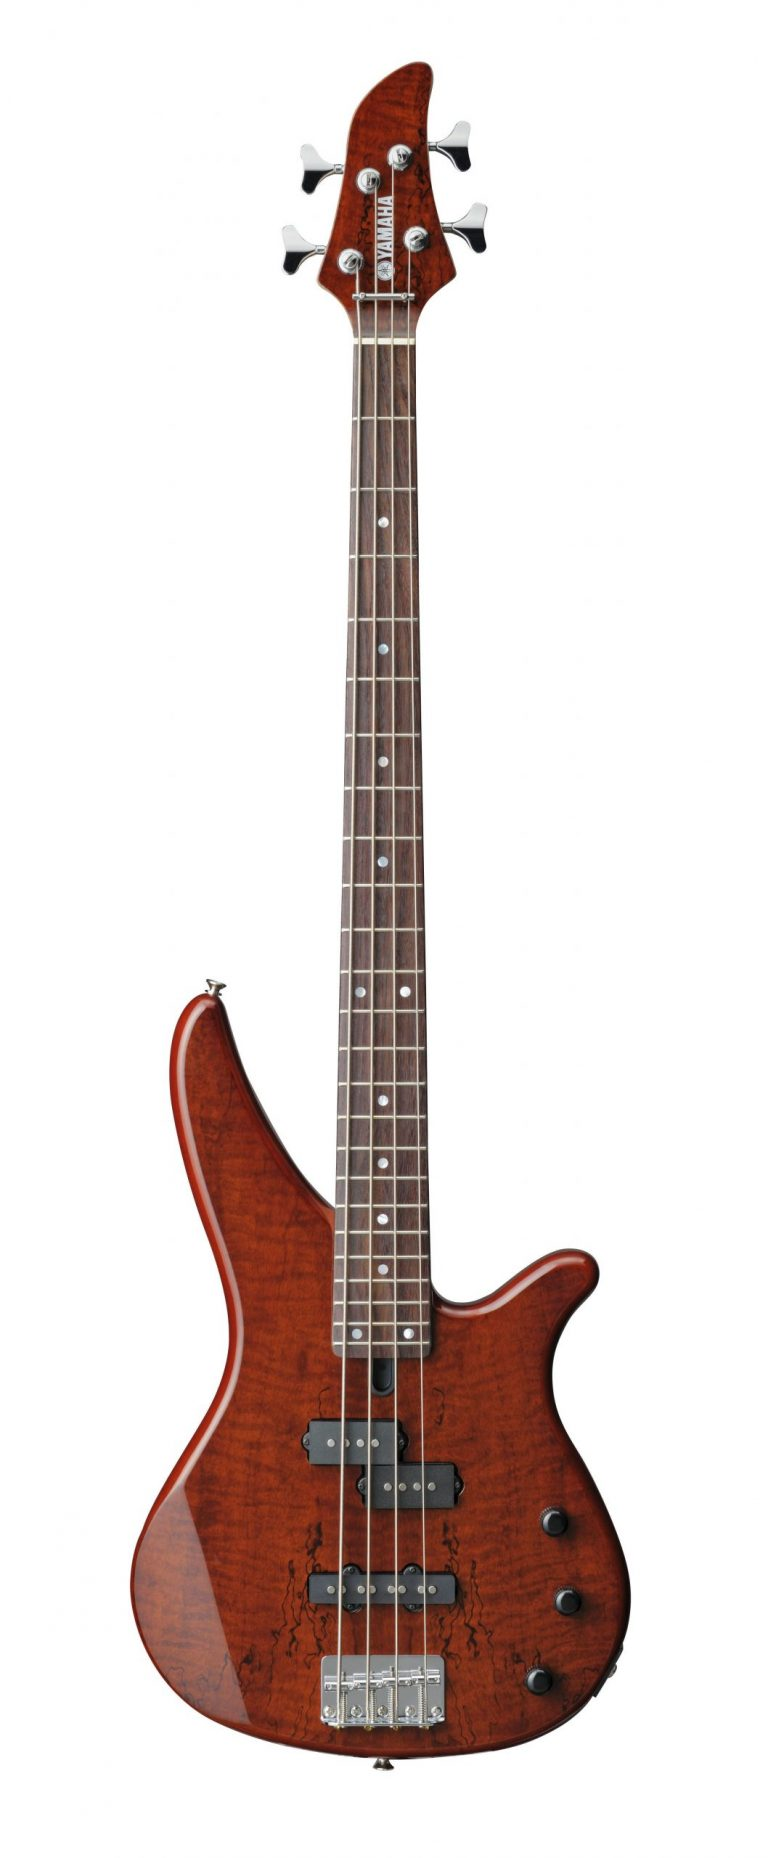 Bass Yamaha RBX170 RED ขายราคาพิเศษ